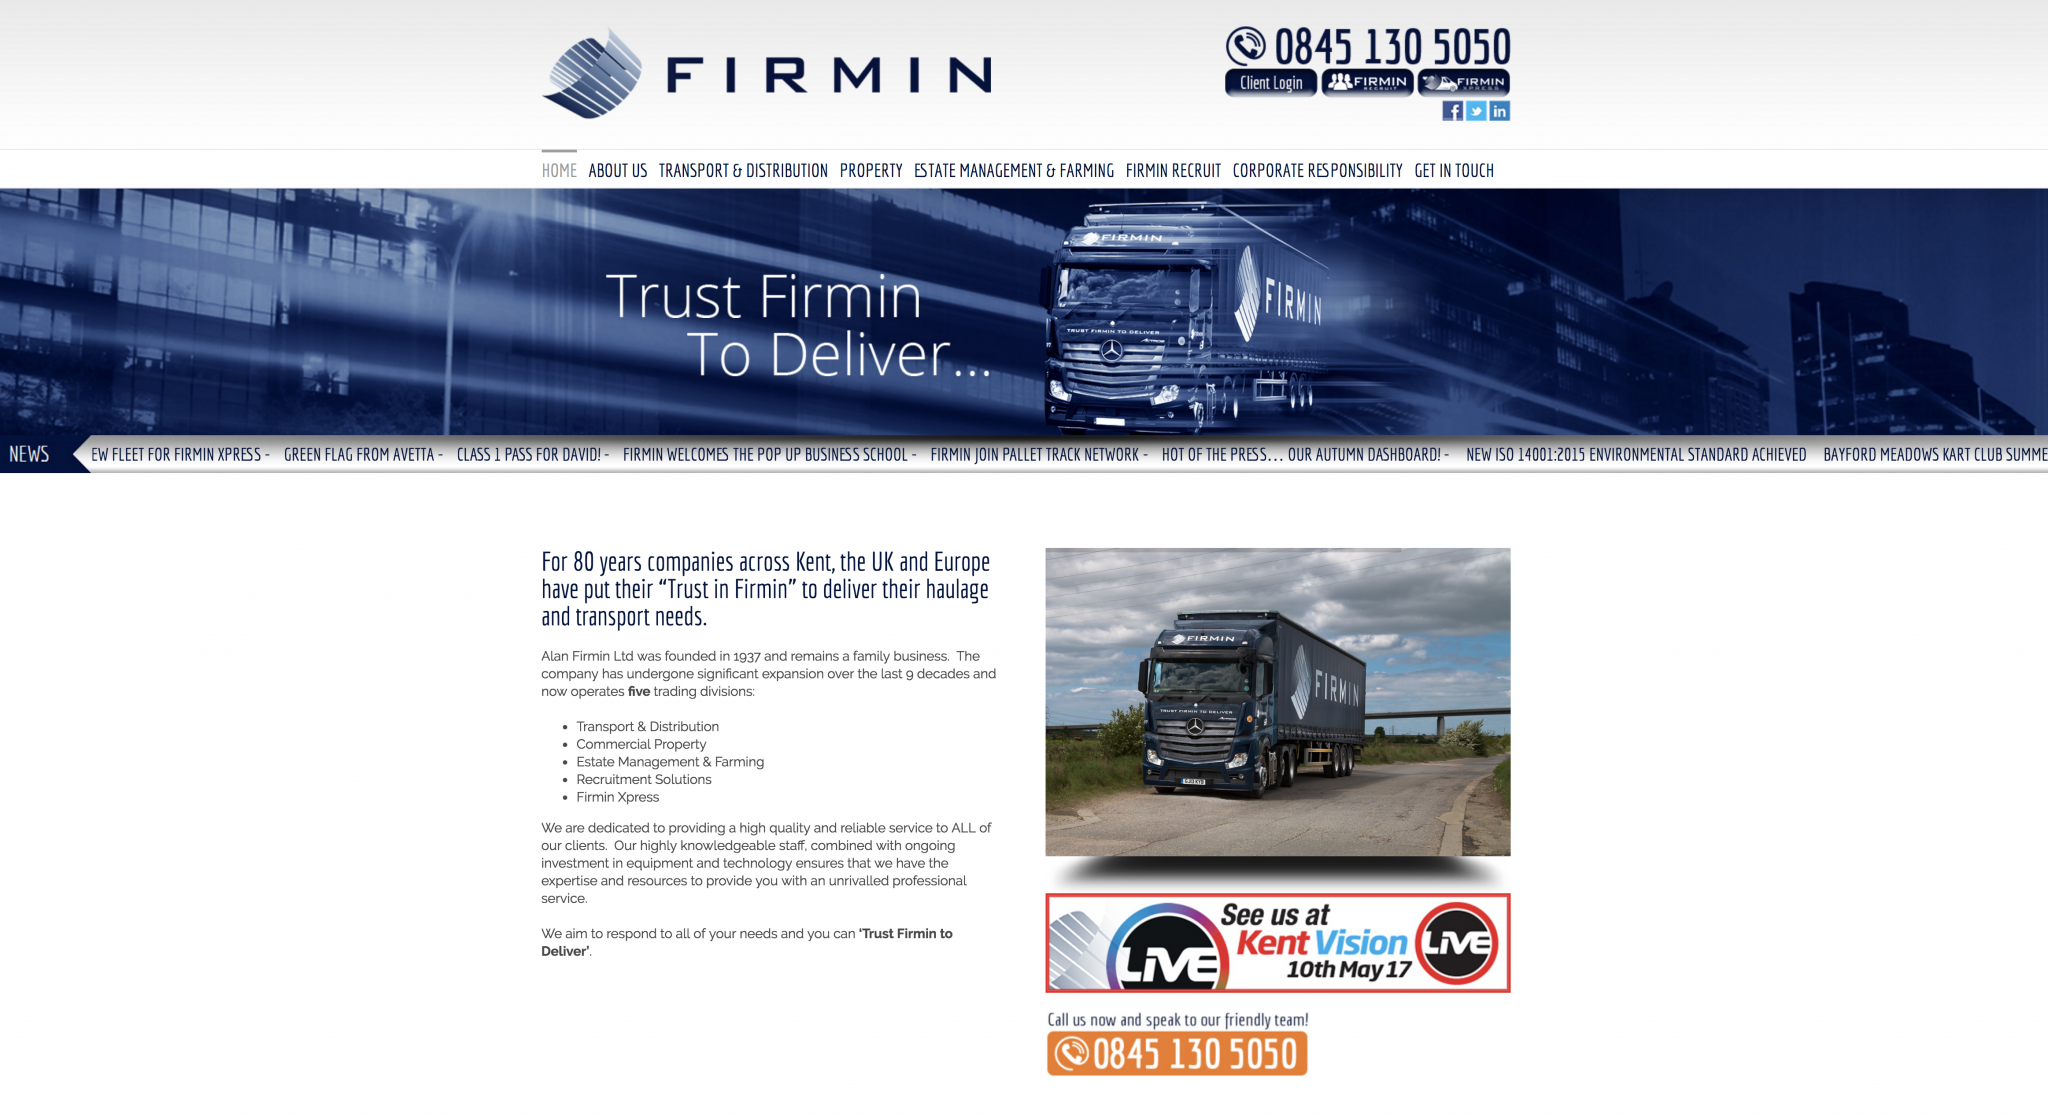 Trust Firmin Del livery